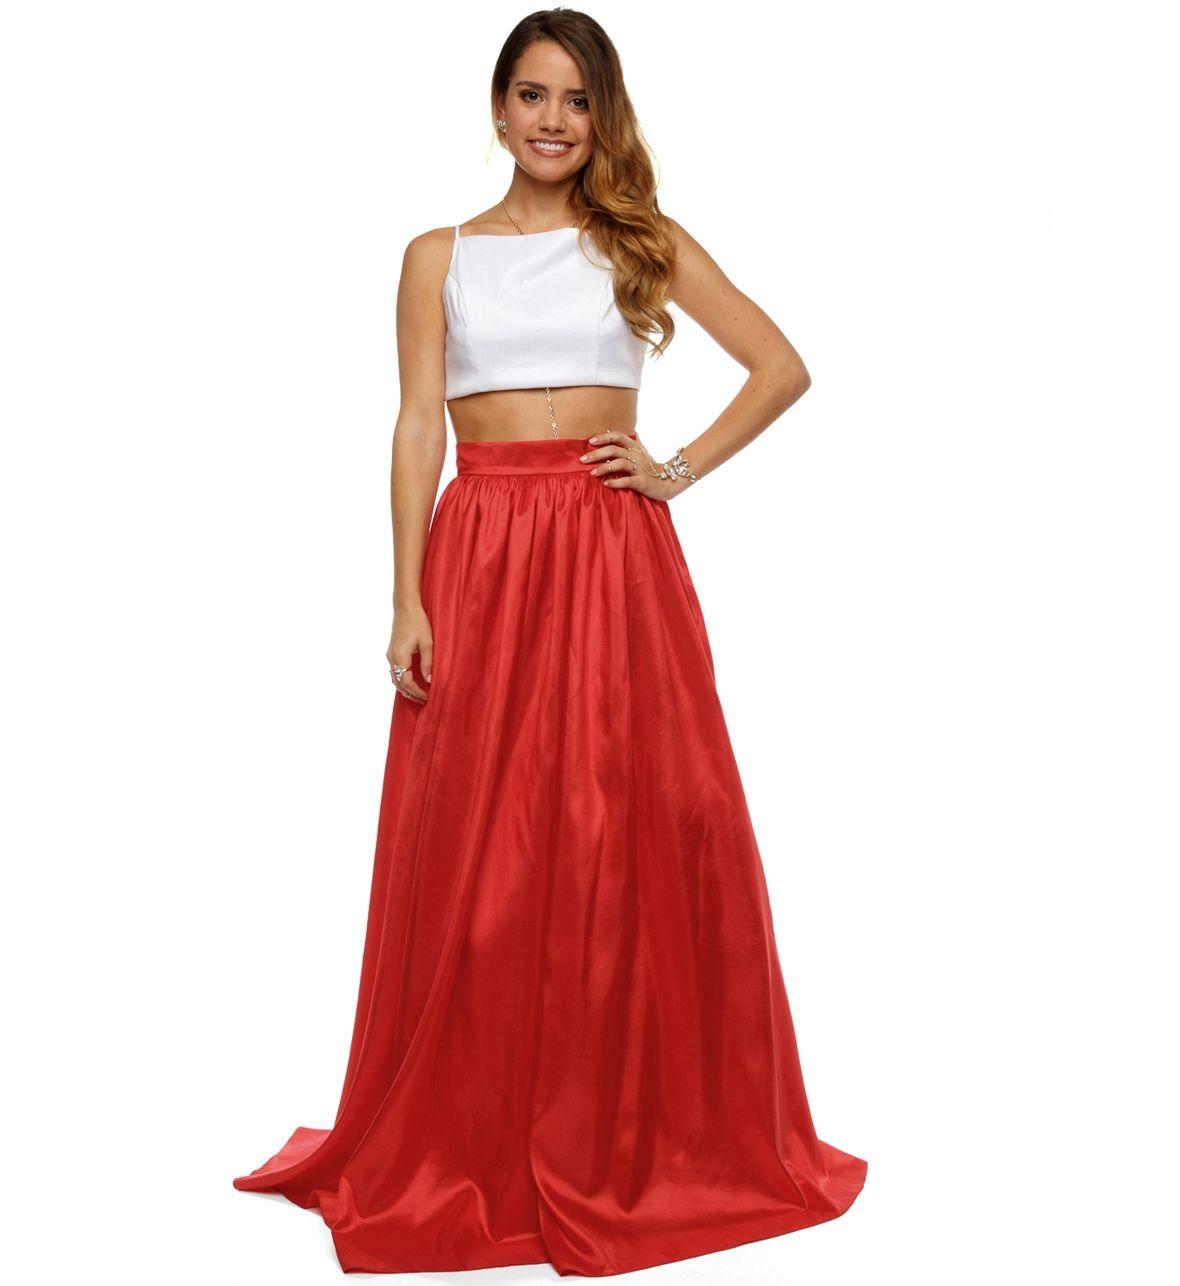 Preorder sarah red prom dress at windsorstore dresses